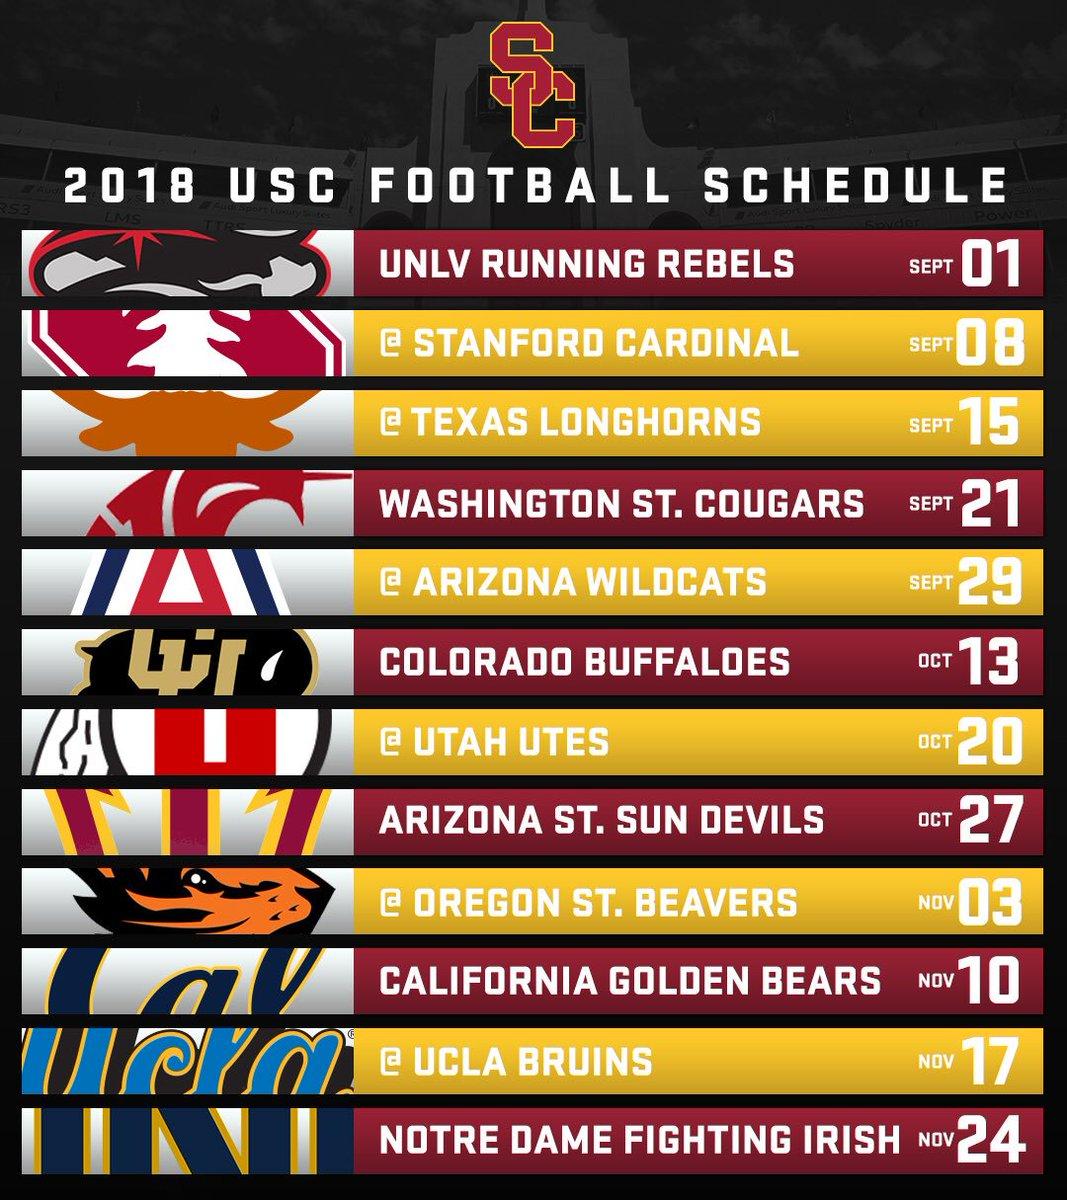 Usc Trojans On Twitter First Look The 2018 Usc Football Schedule Https T Co Oqzwsdp5bl Fighton